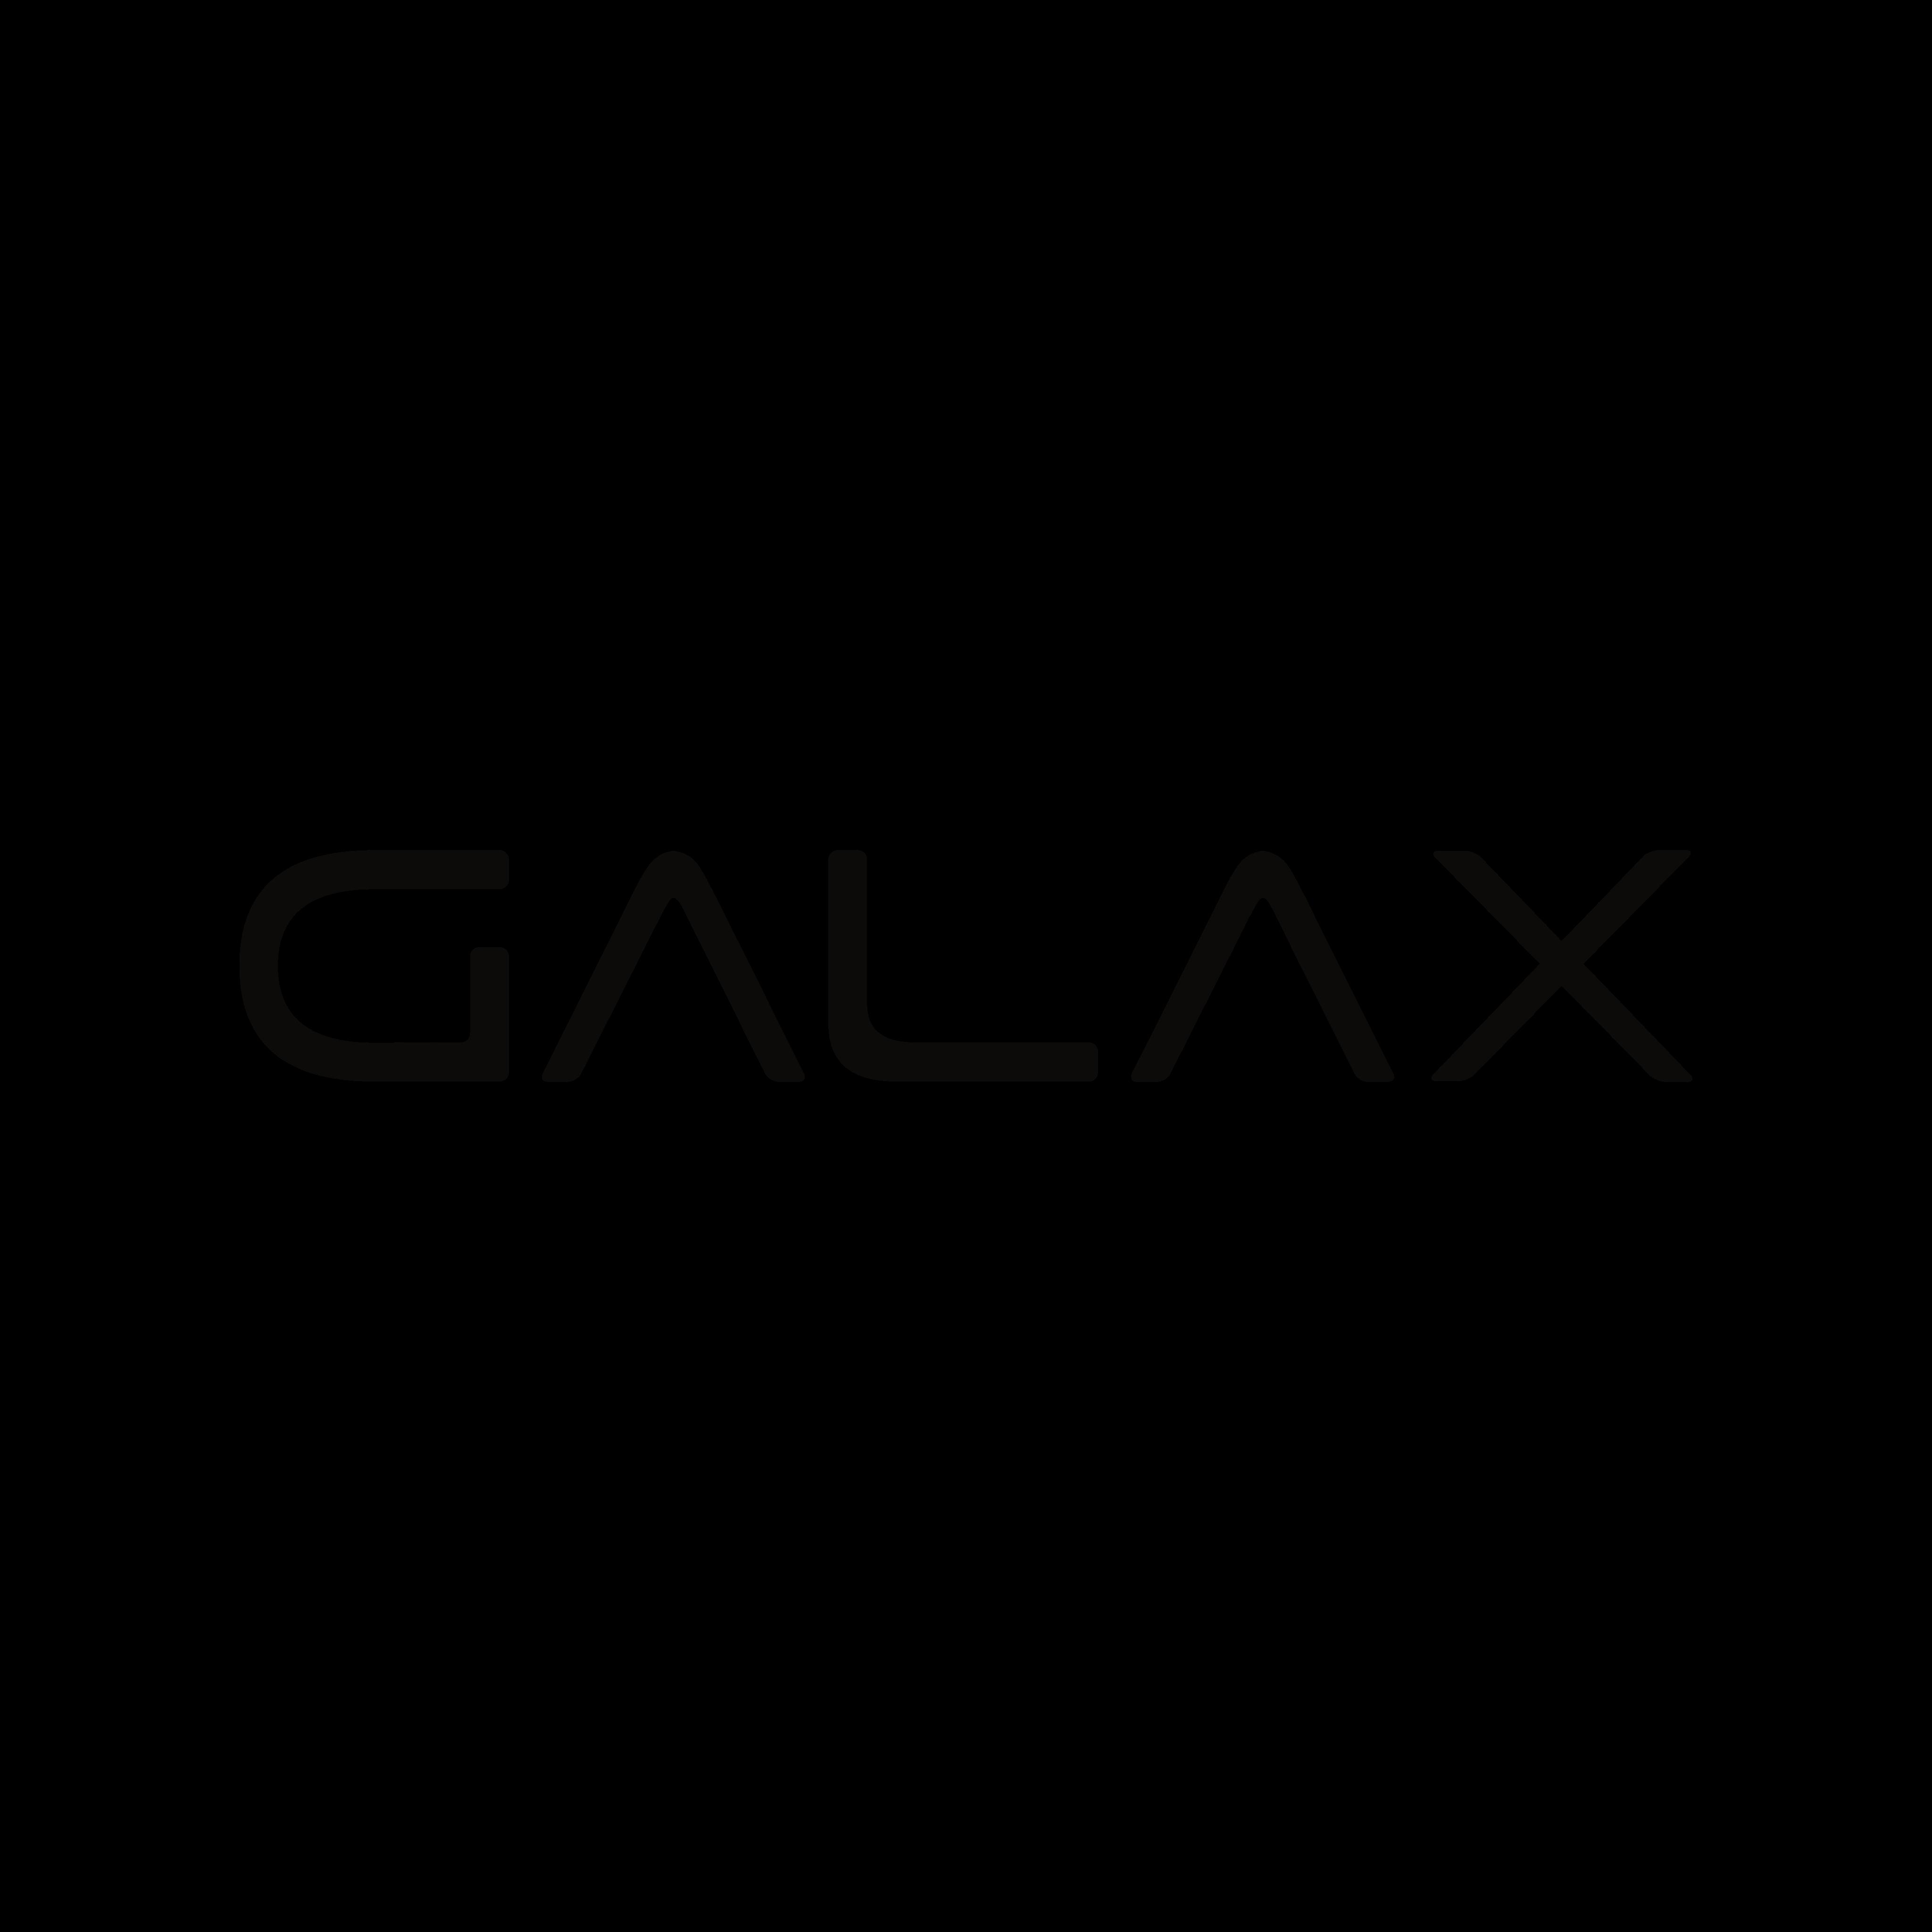 Galax Logo PNG.